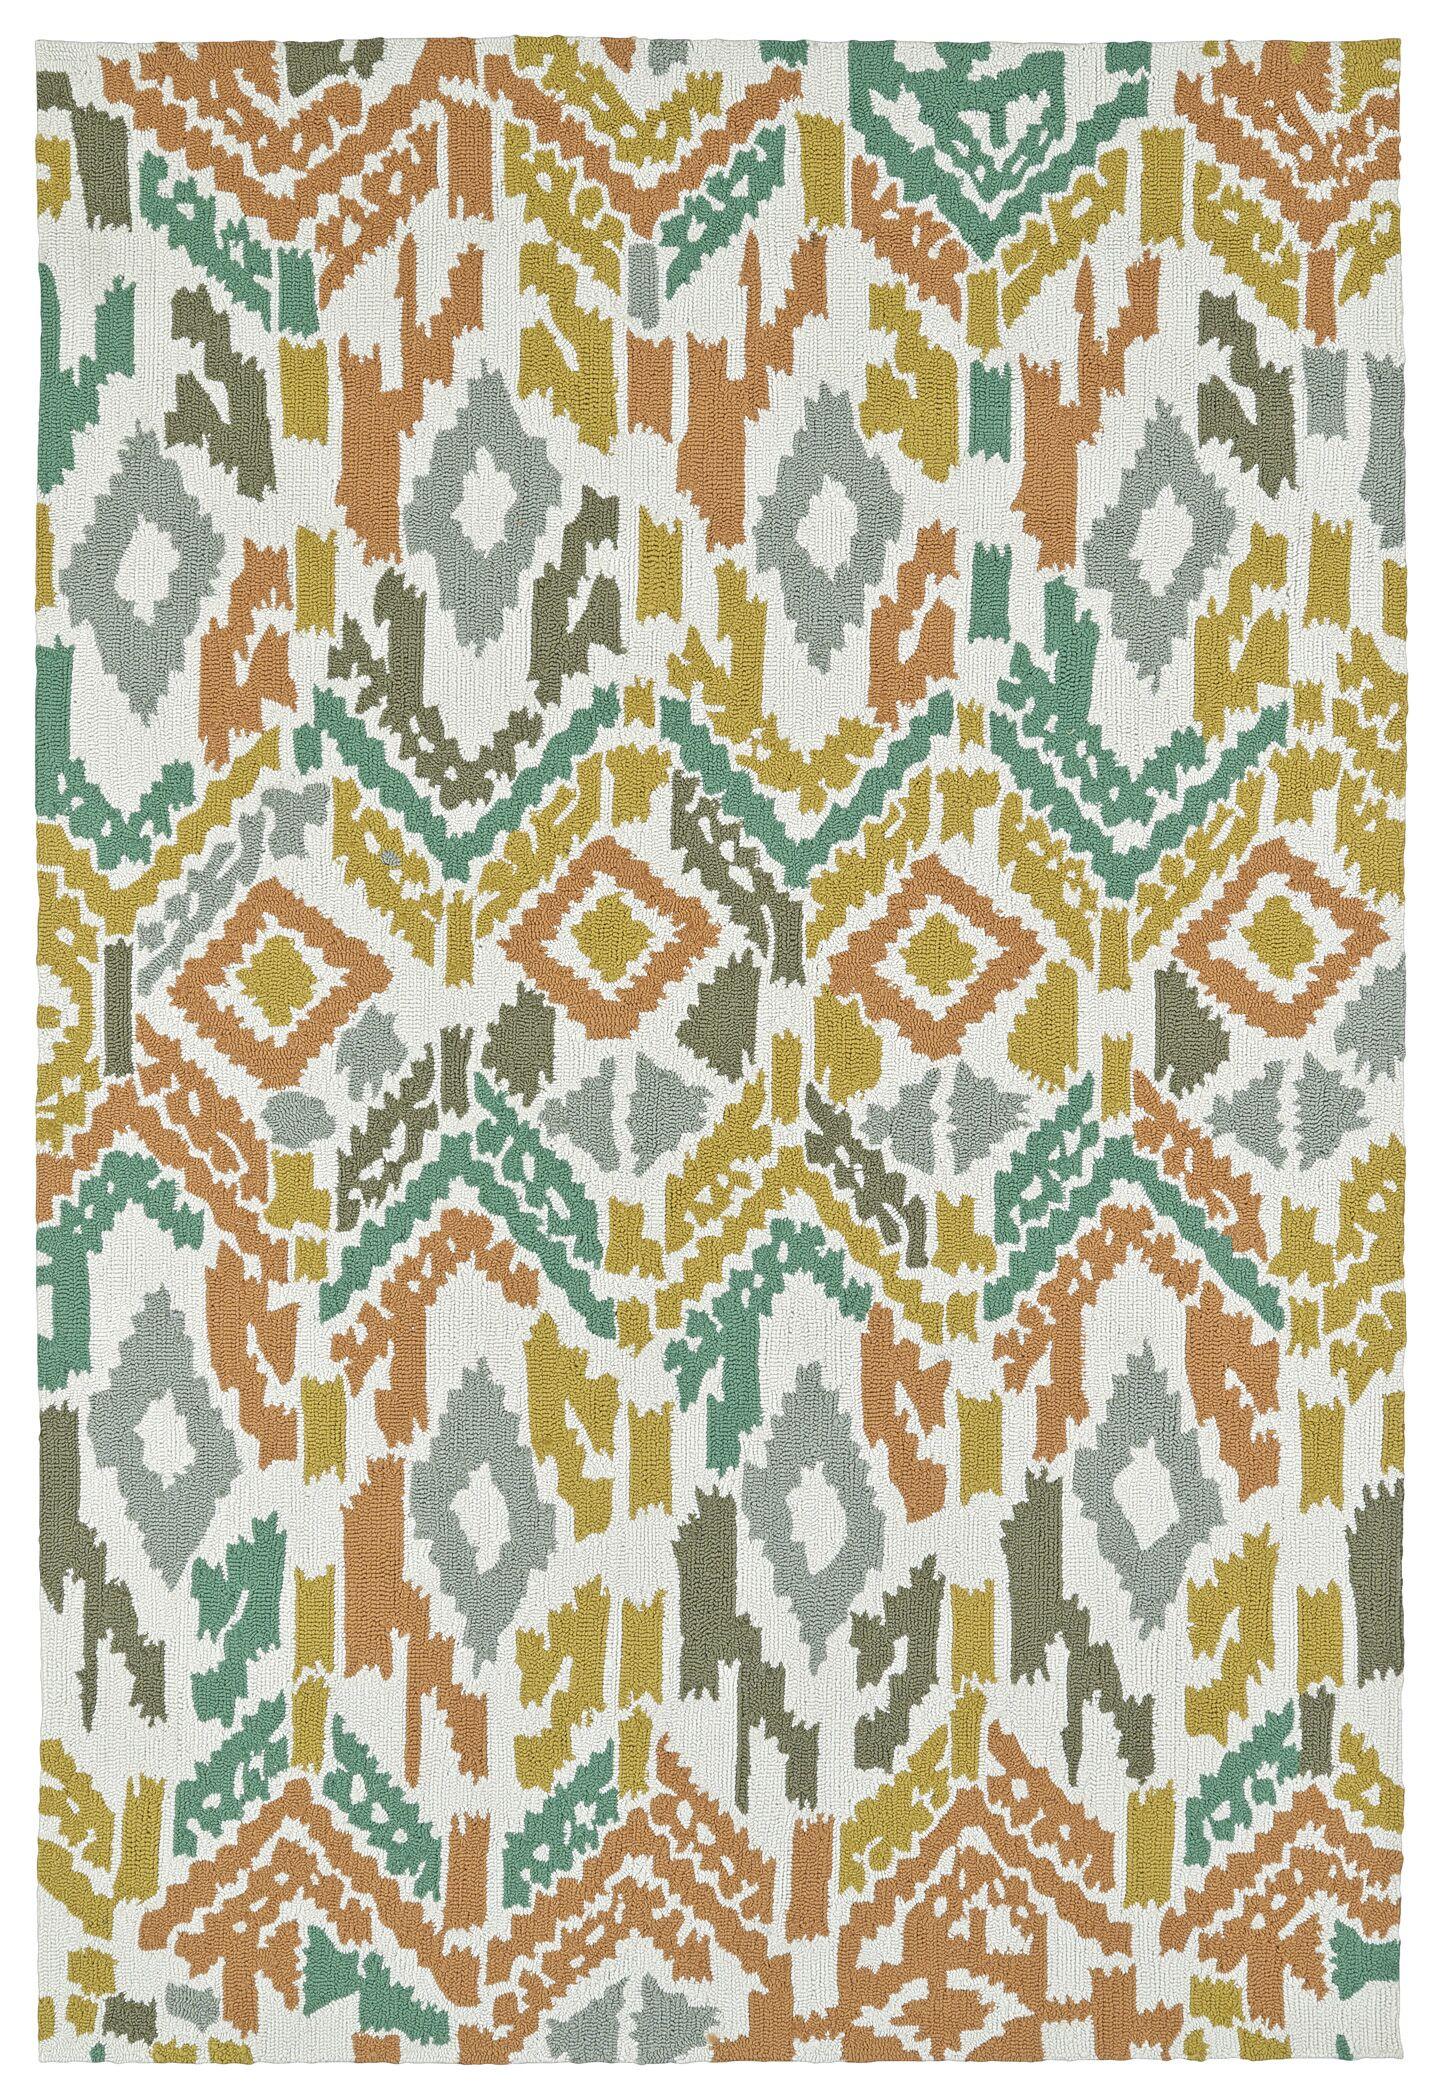 Michele Handmade Indoor / Outdoor Area Rug Rug Size: Rectangle 8' x 10'